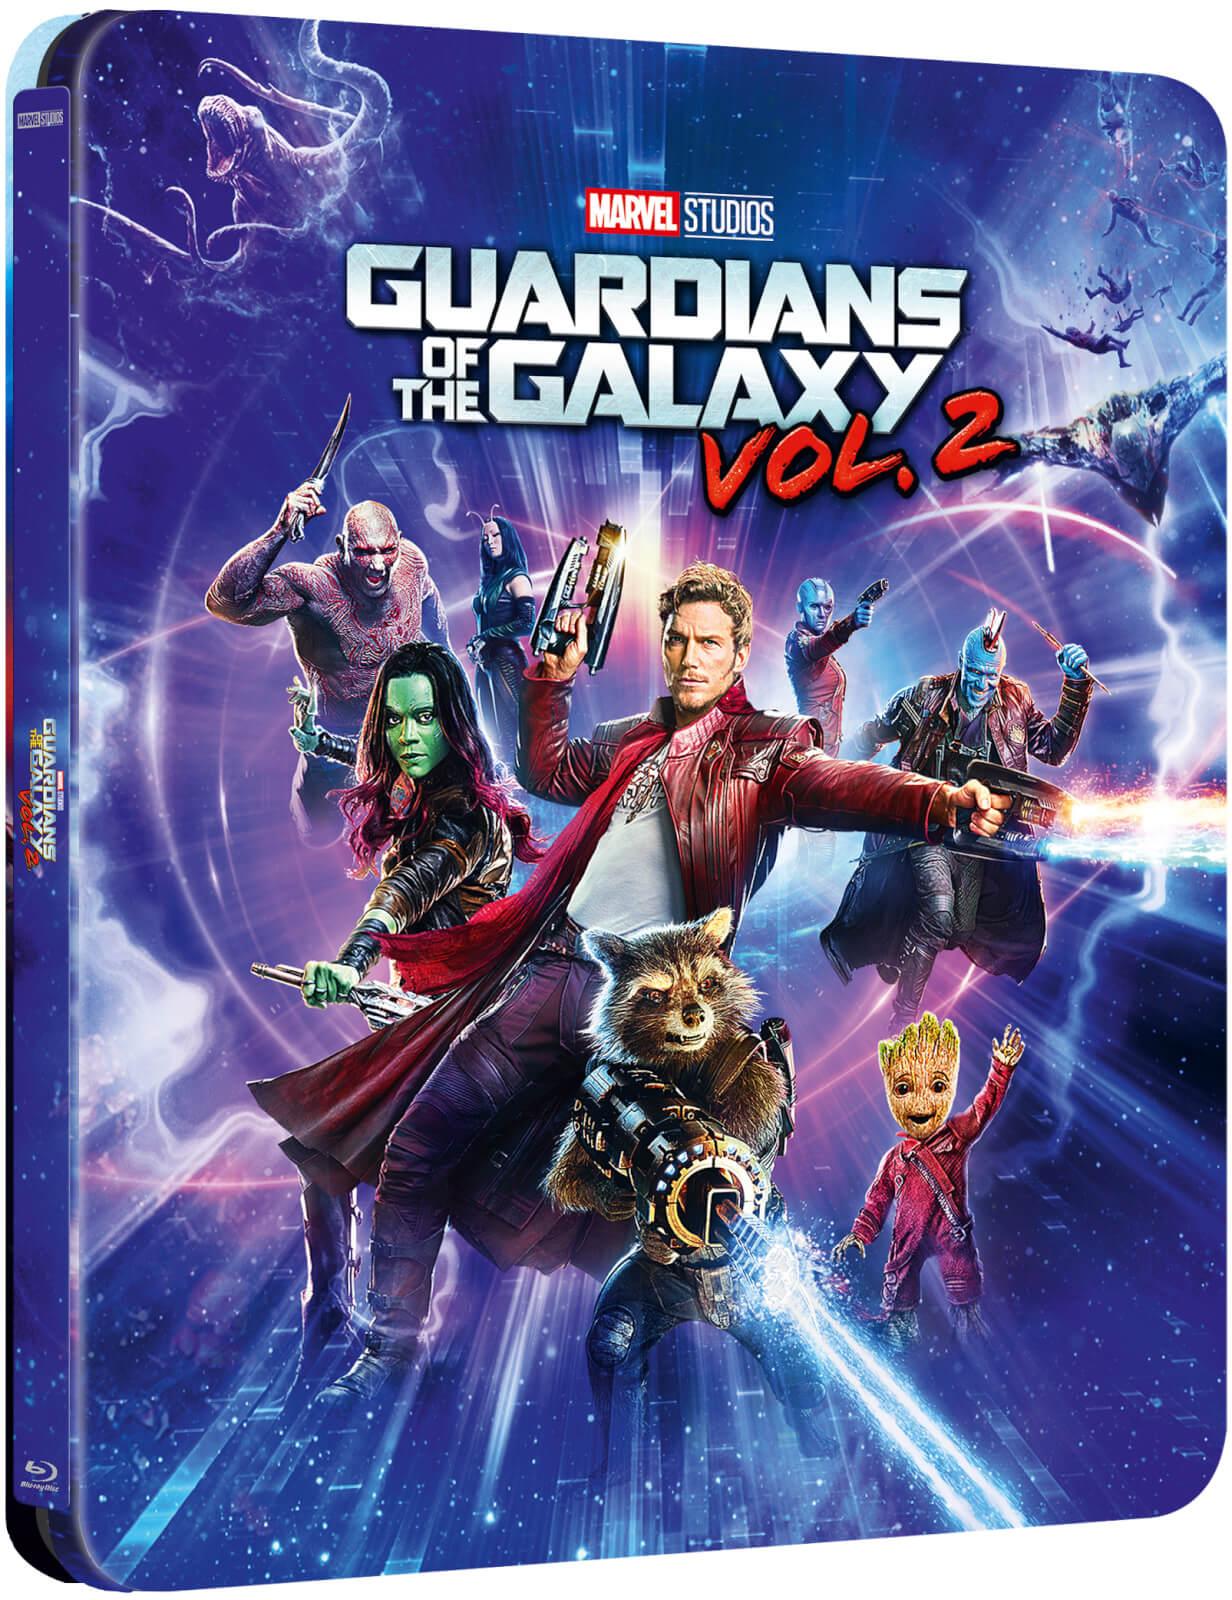 Guardians of the Galaxy Vol. 2 SteelBook